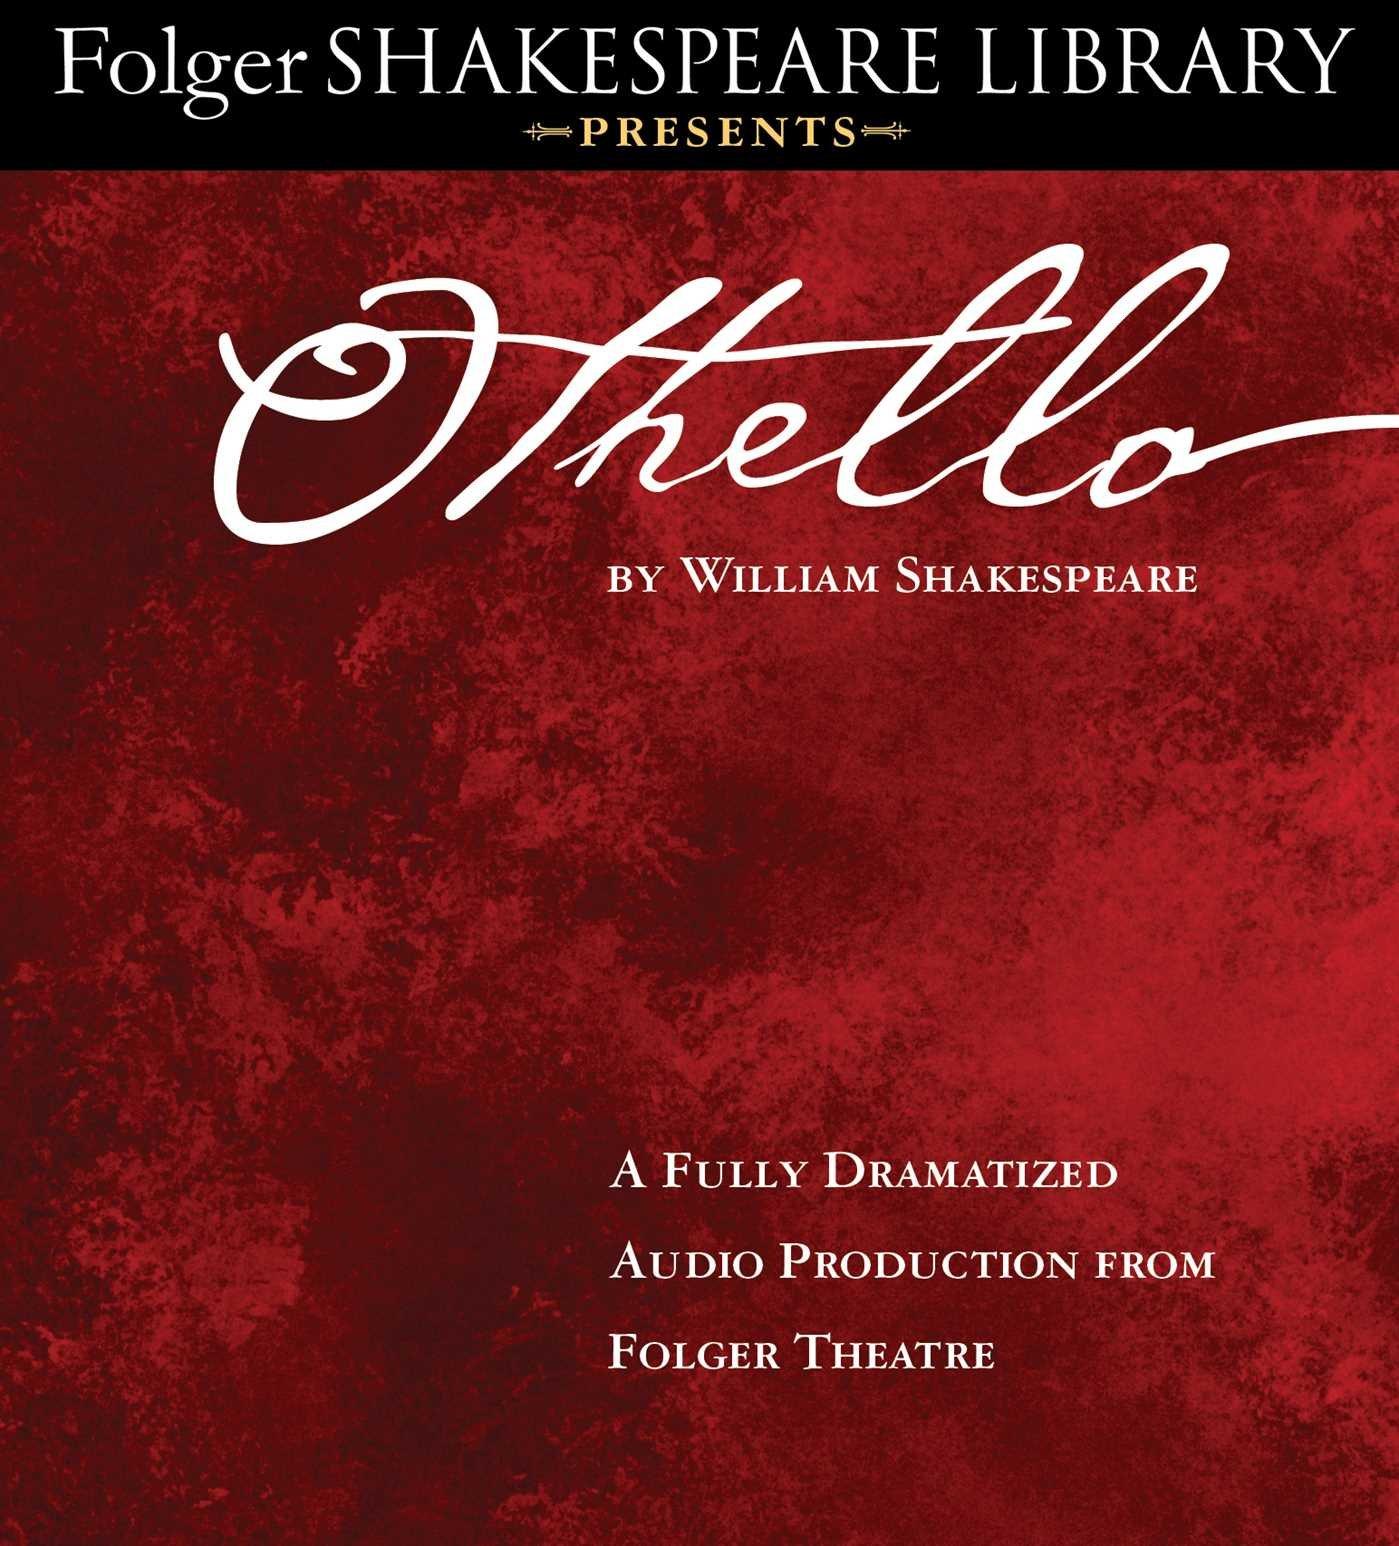 Amazon.com: Othello: Fully Dramatized Audio Edition (Folger Shakespeare  Library Presents) (9781442374324): William Shakespeare, Full Cast  Dramatization: ...